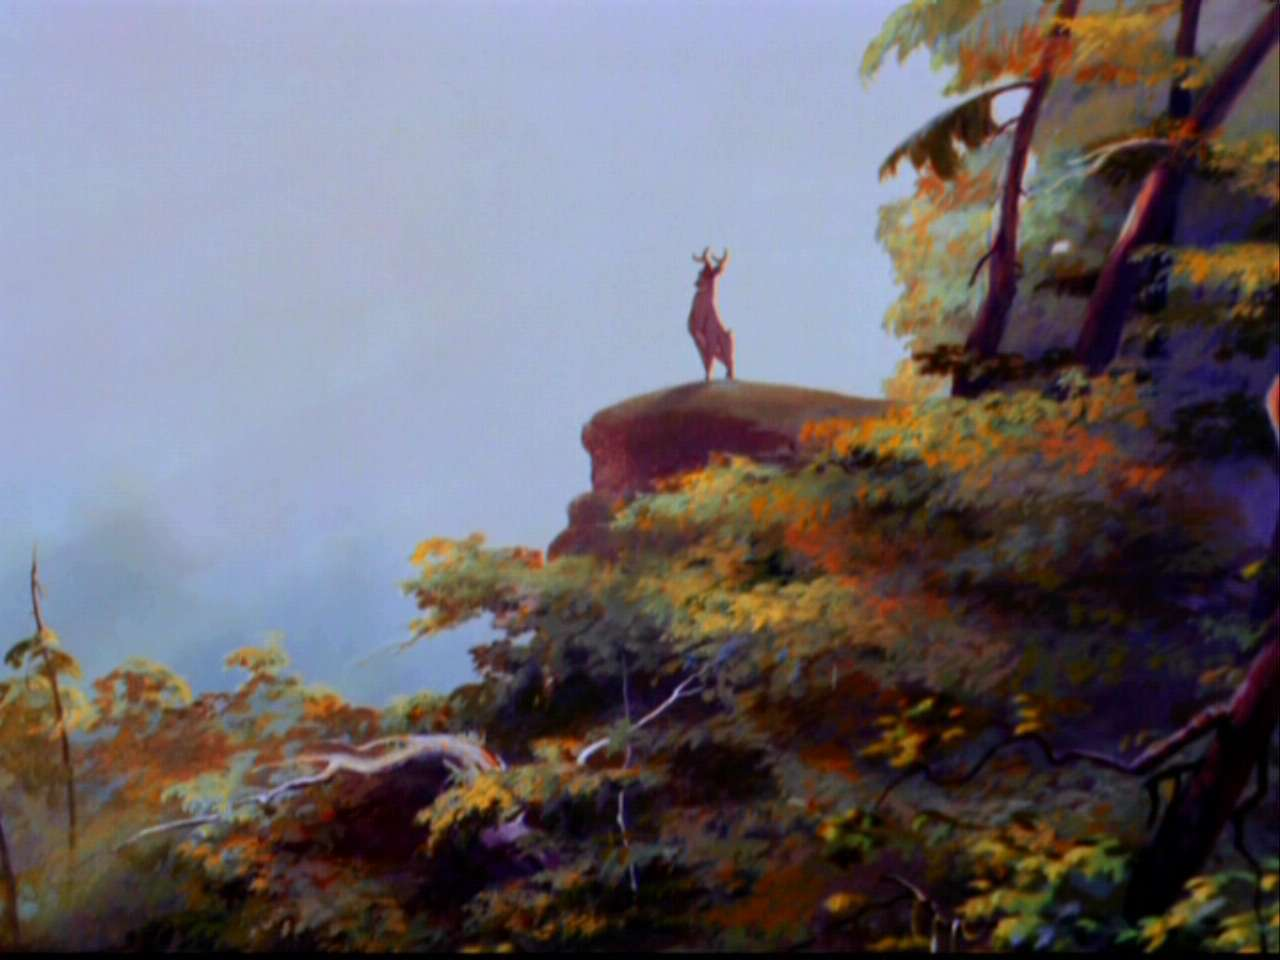 Bambi-bambi-5798134-1280-960.jpg